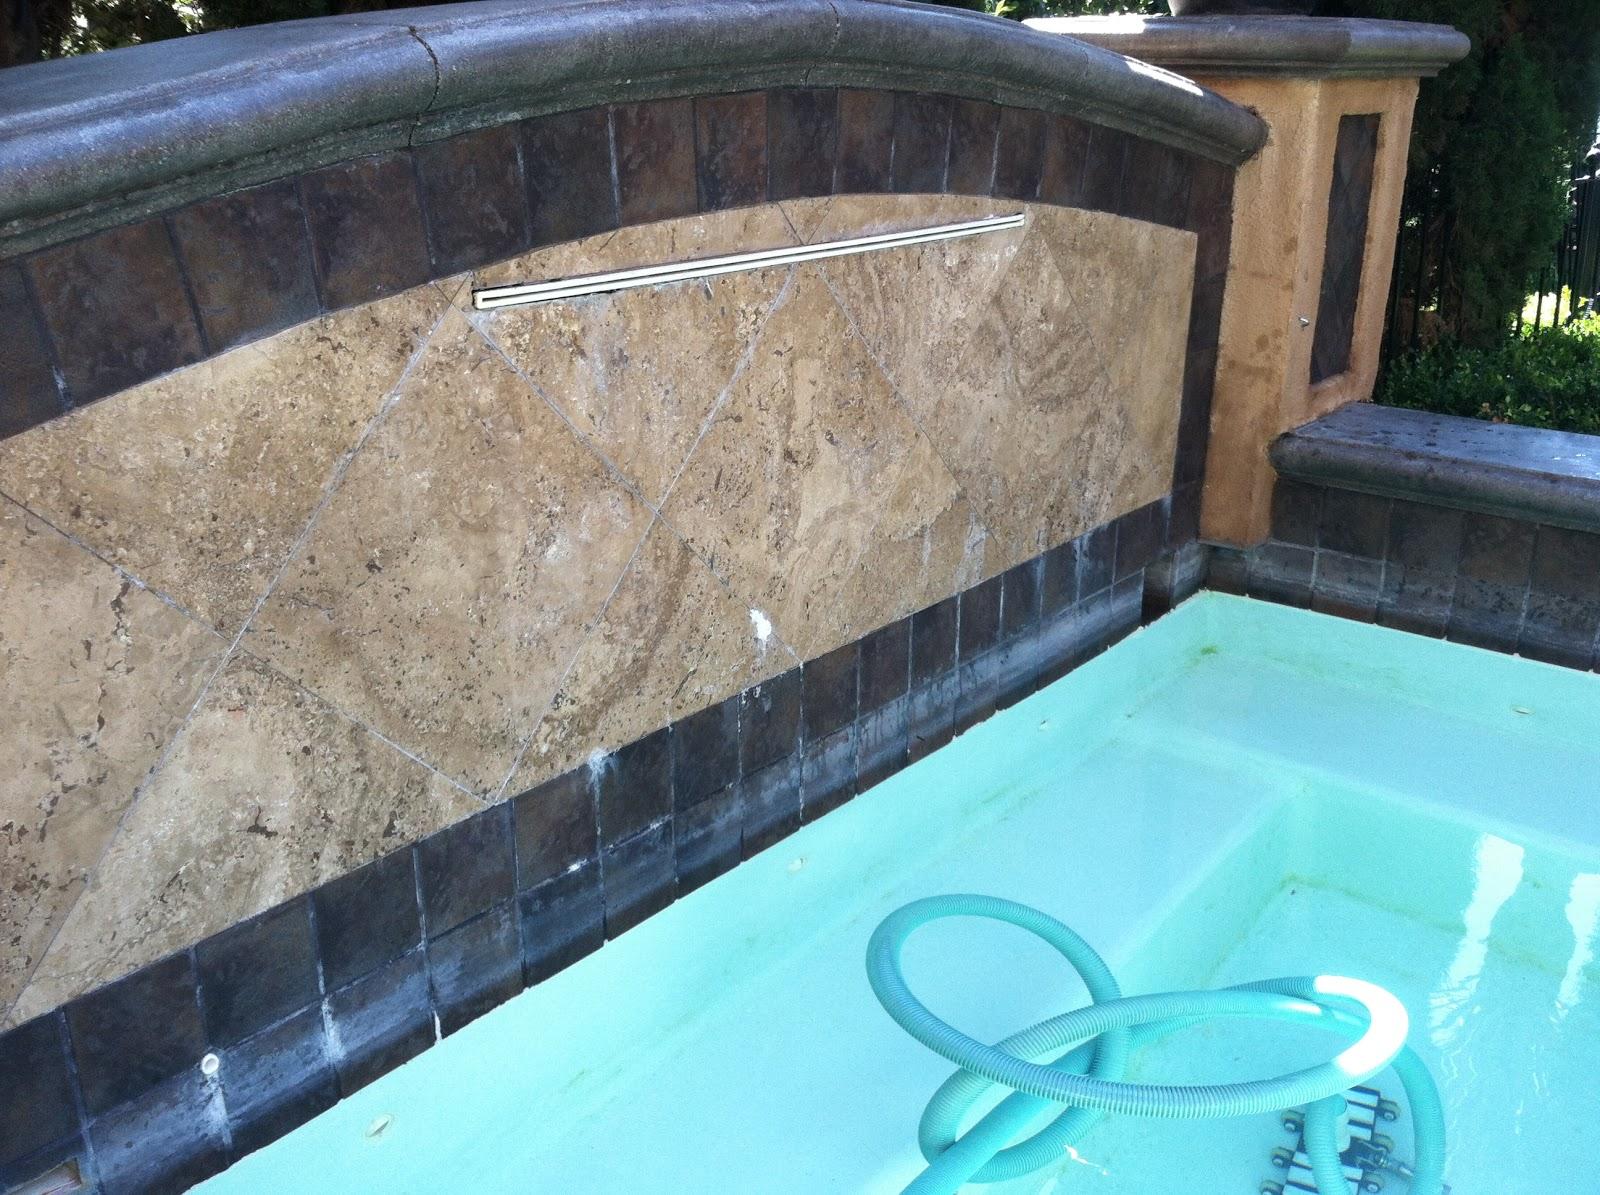 Oc La Palm Springs Riverside Pool Tile Cleaning And Repair